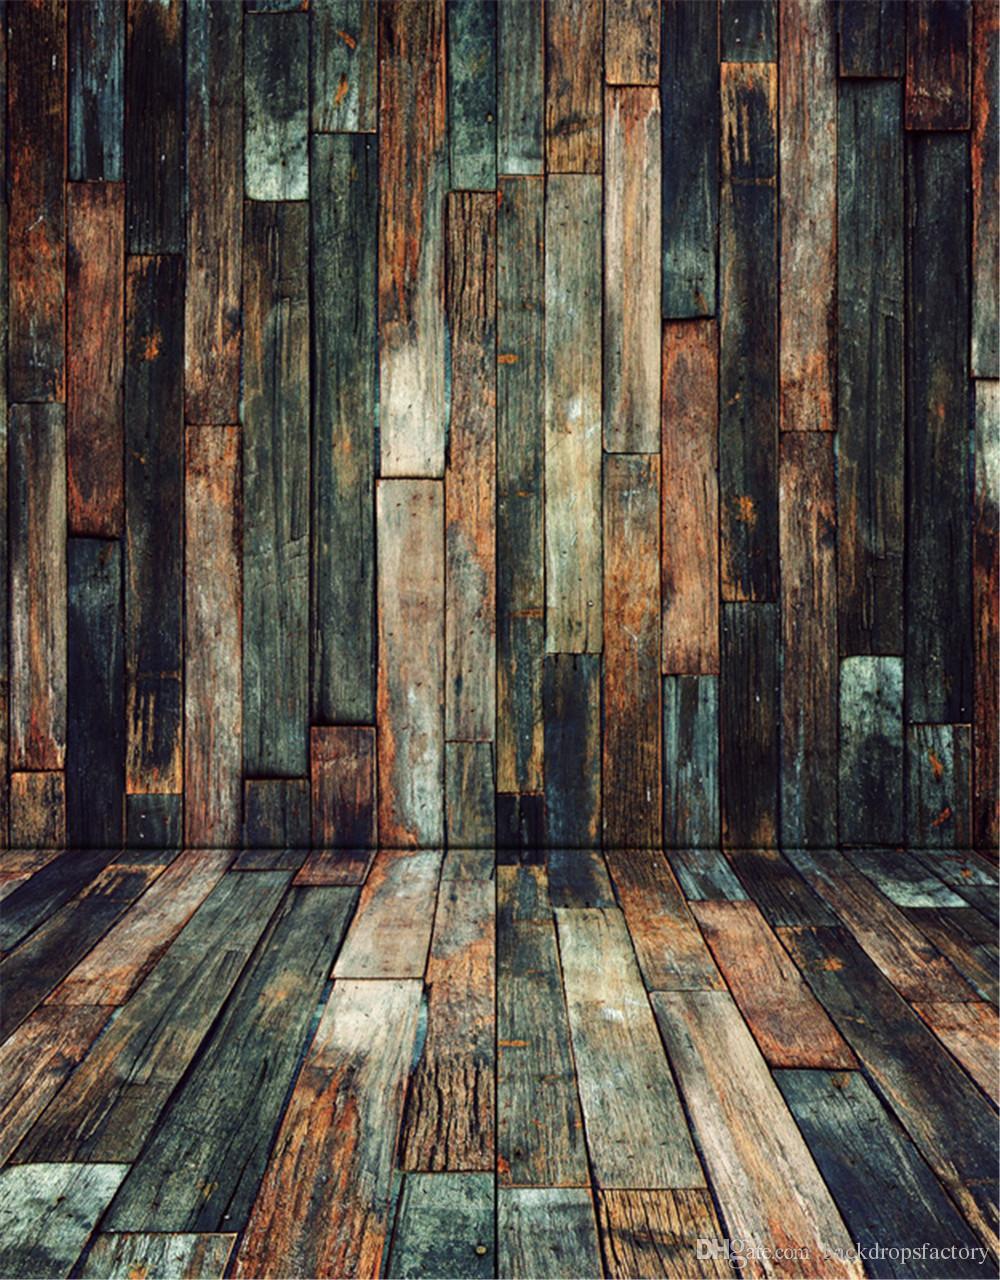 Vintage Dark Wooden Planks Wall Floor Photography Backdrop Digital